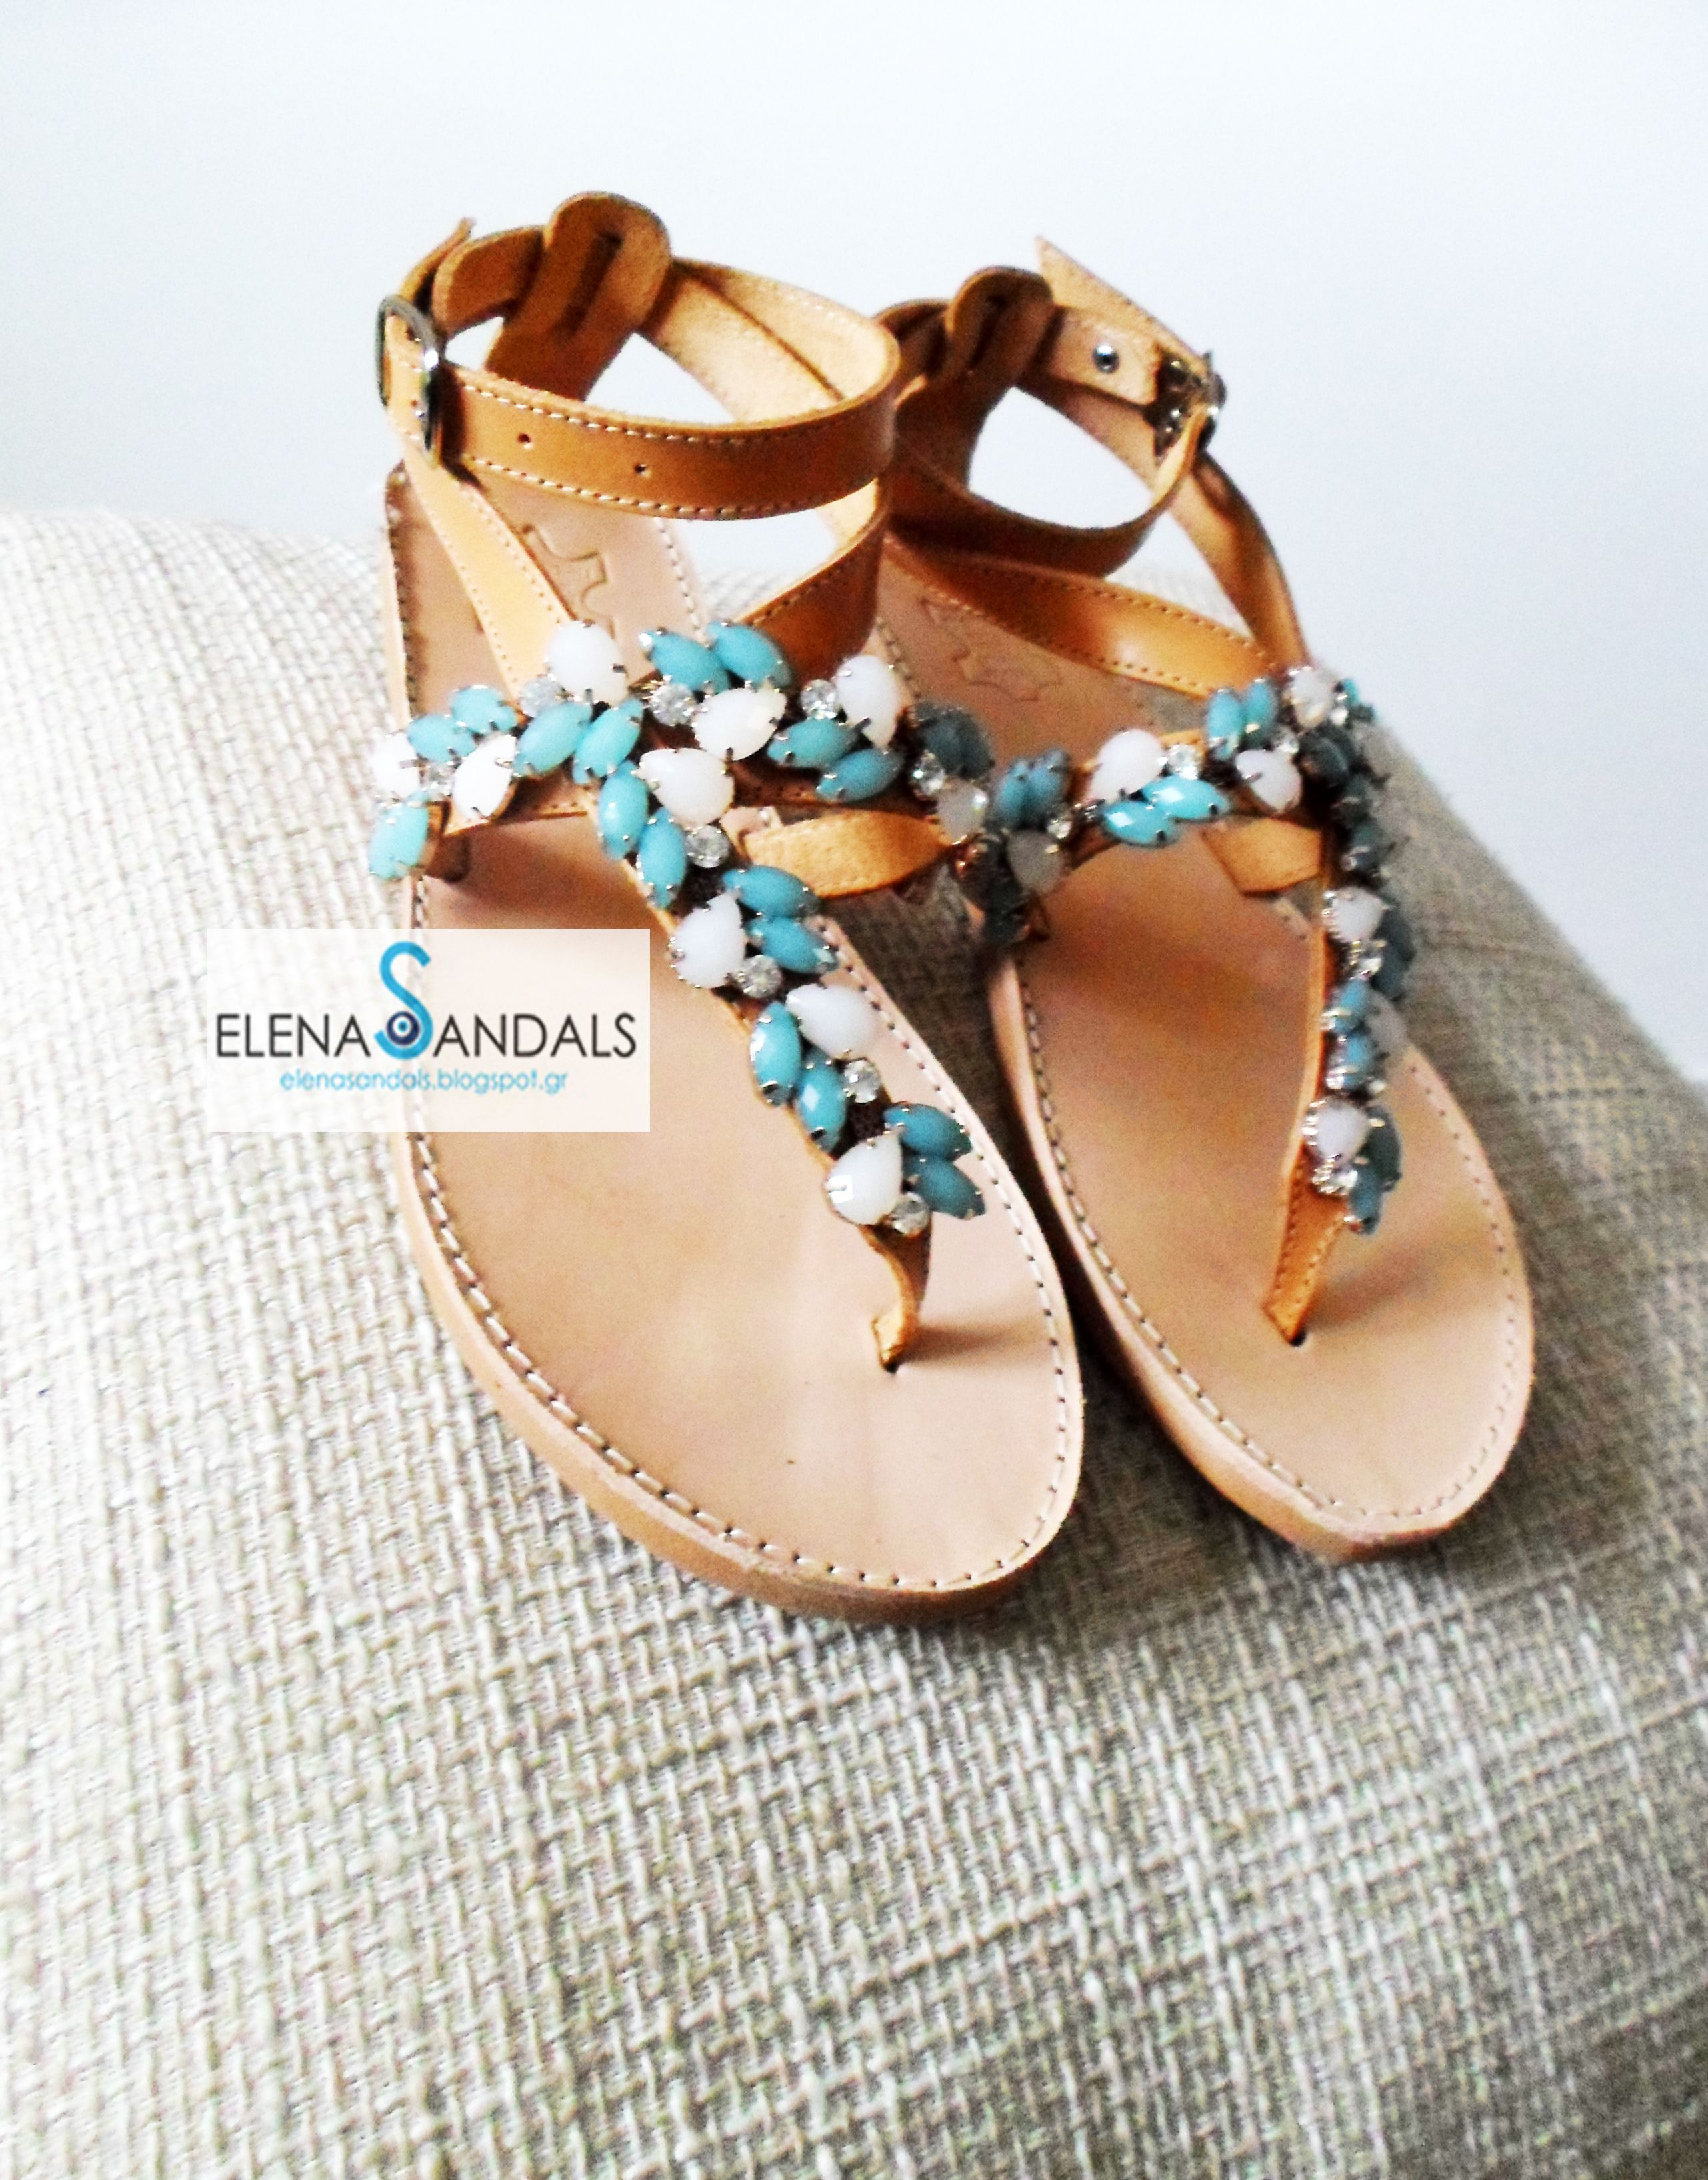 e9112841b74 Χειροποίητα σανδάλια δερμάτινα /handmade leather woman sandals #sandals  #summer #leather #σανδάλια #χειροποίητα elenasandals.blogspot.gr